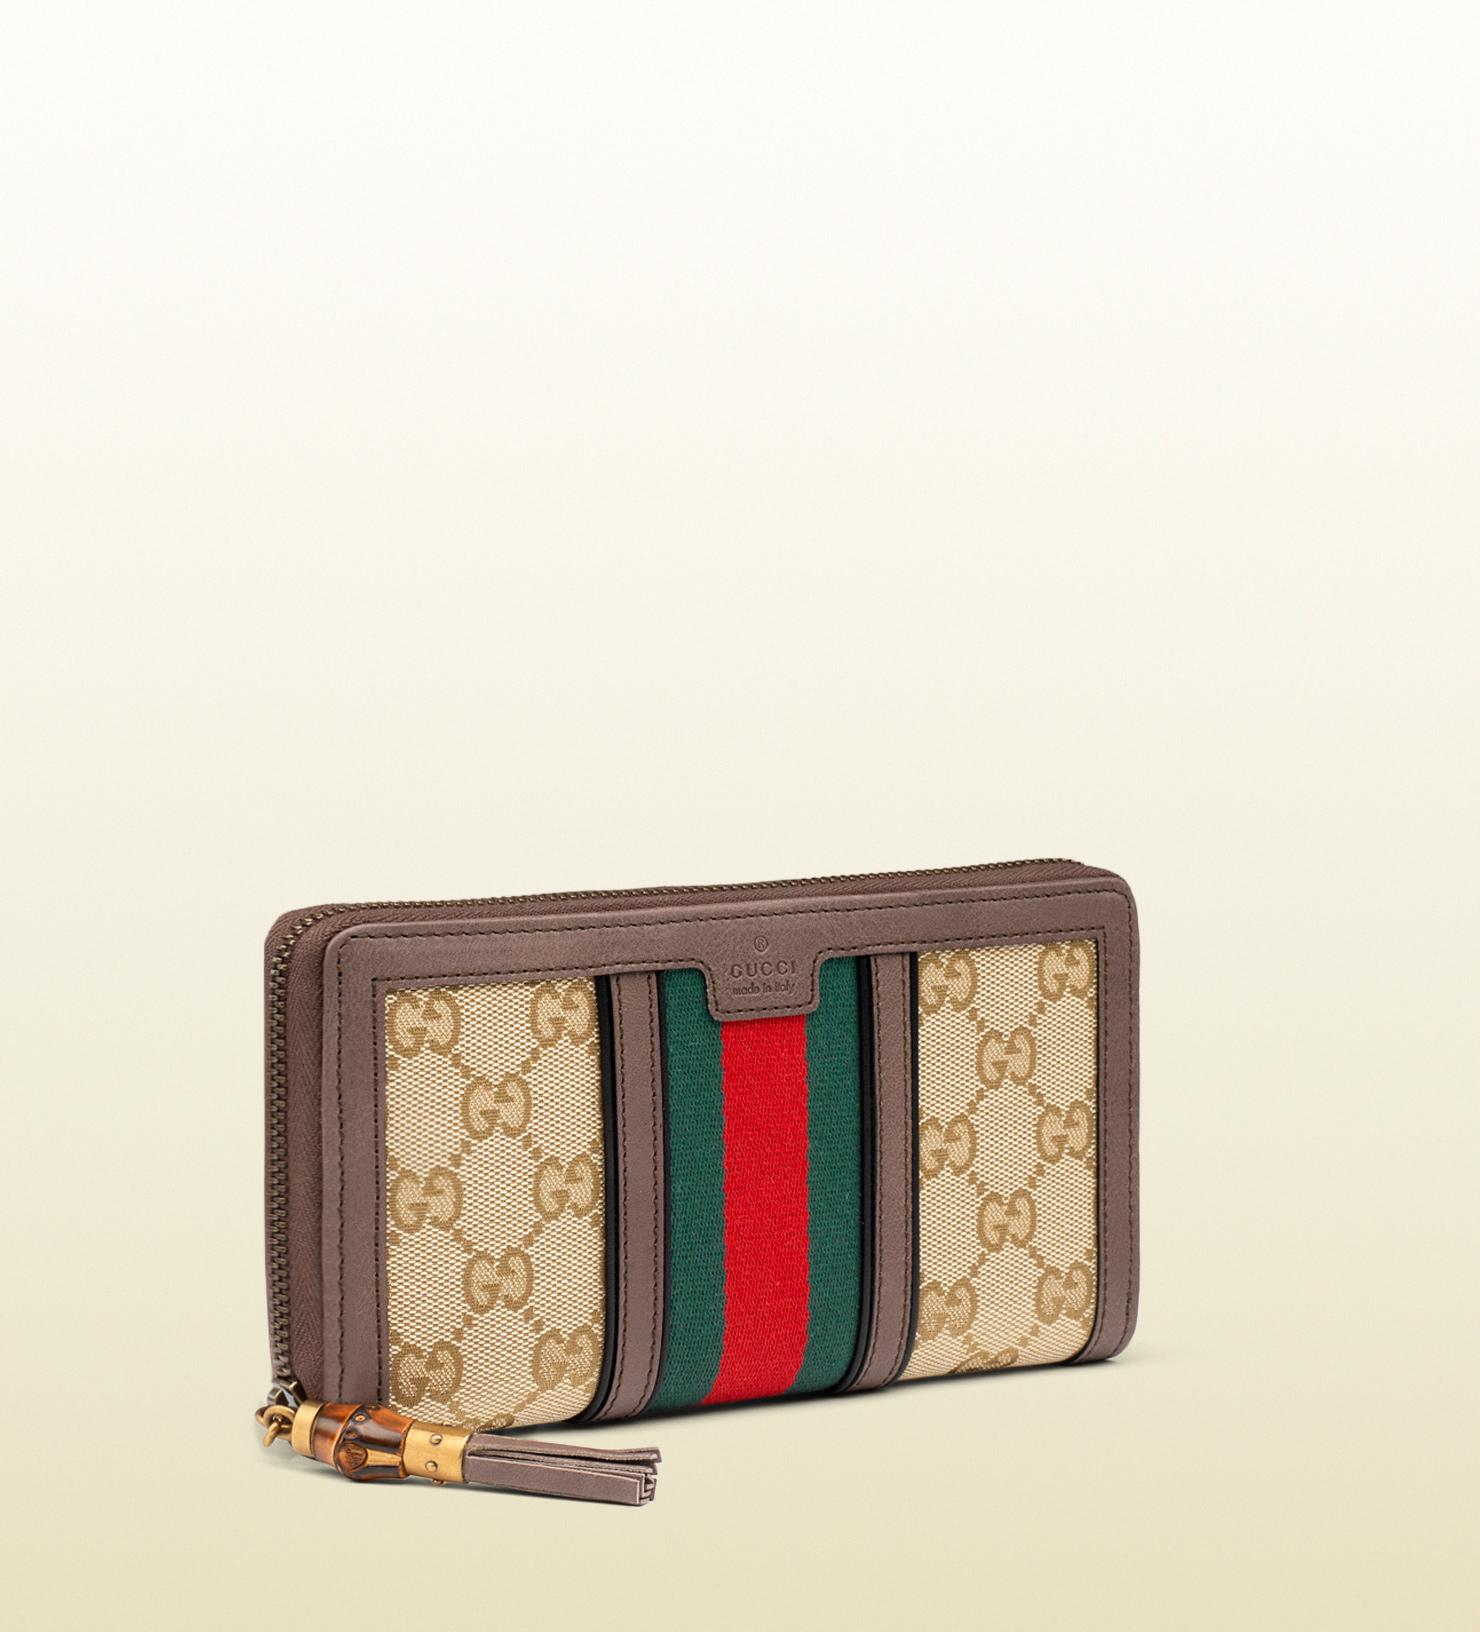 9658f8c01202 Gucci Rania Original Gg Canvas Zip Around Wallet in Red for Men - Lyst